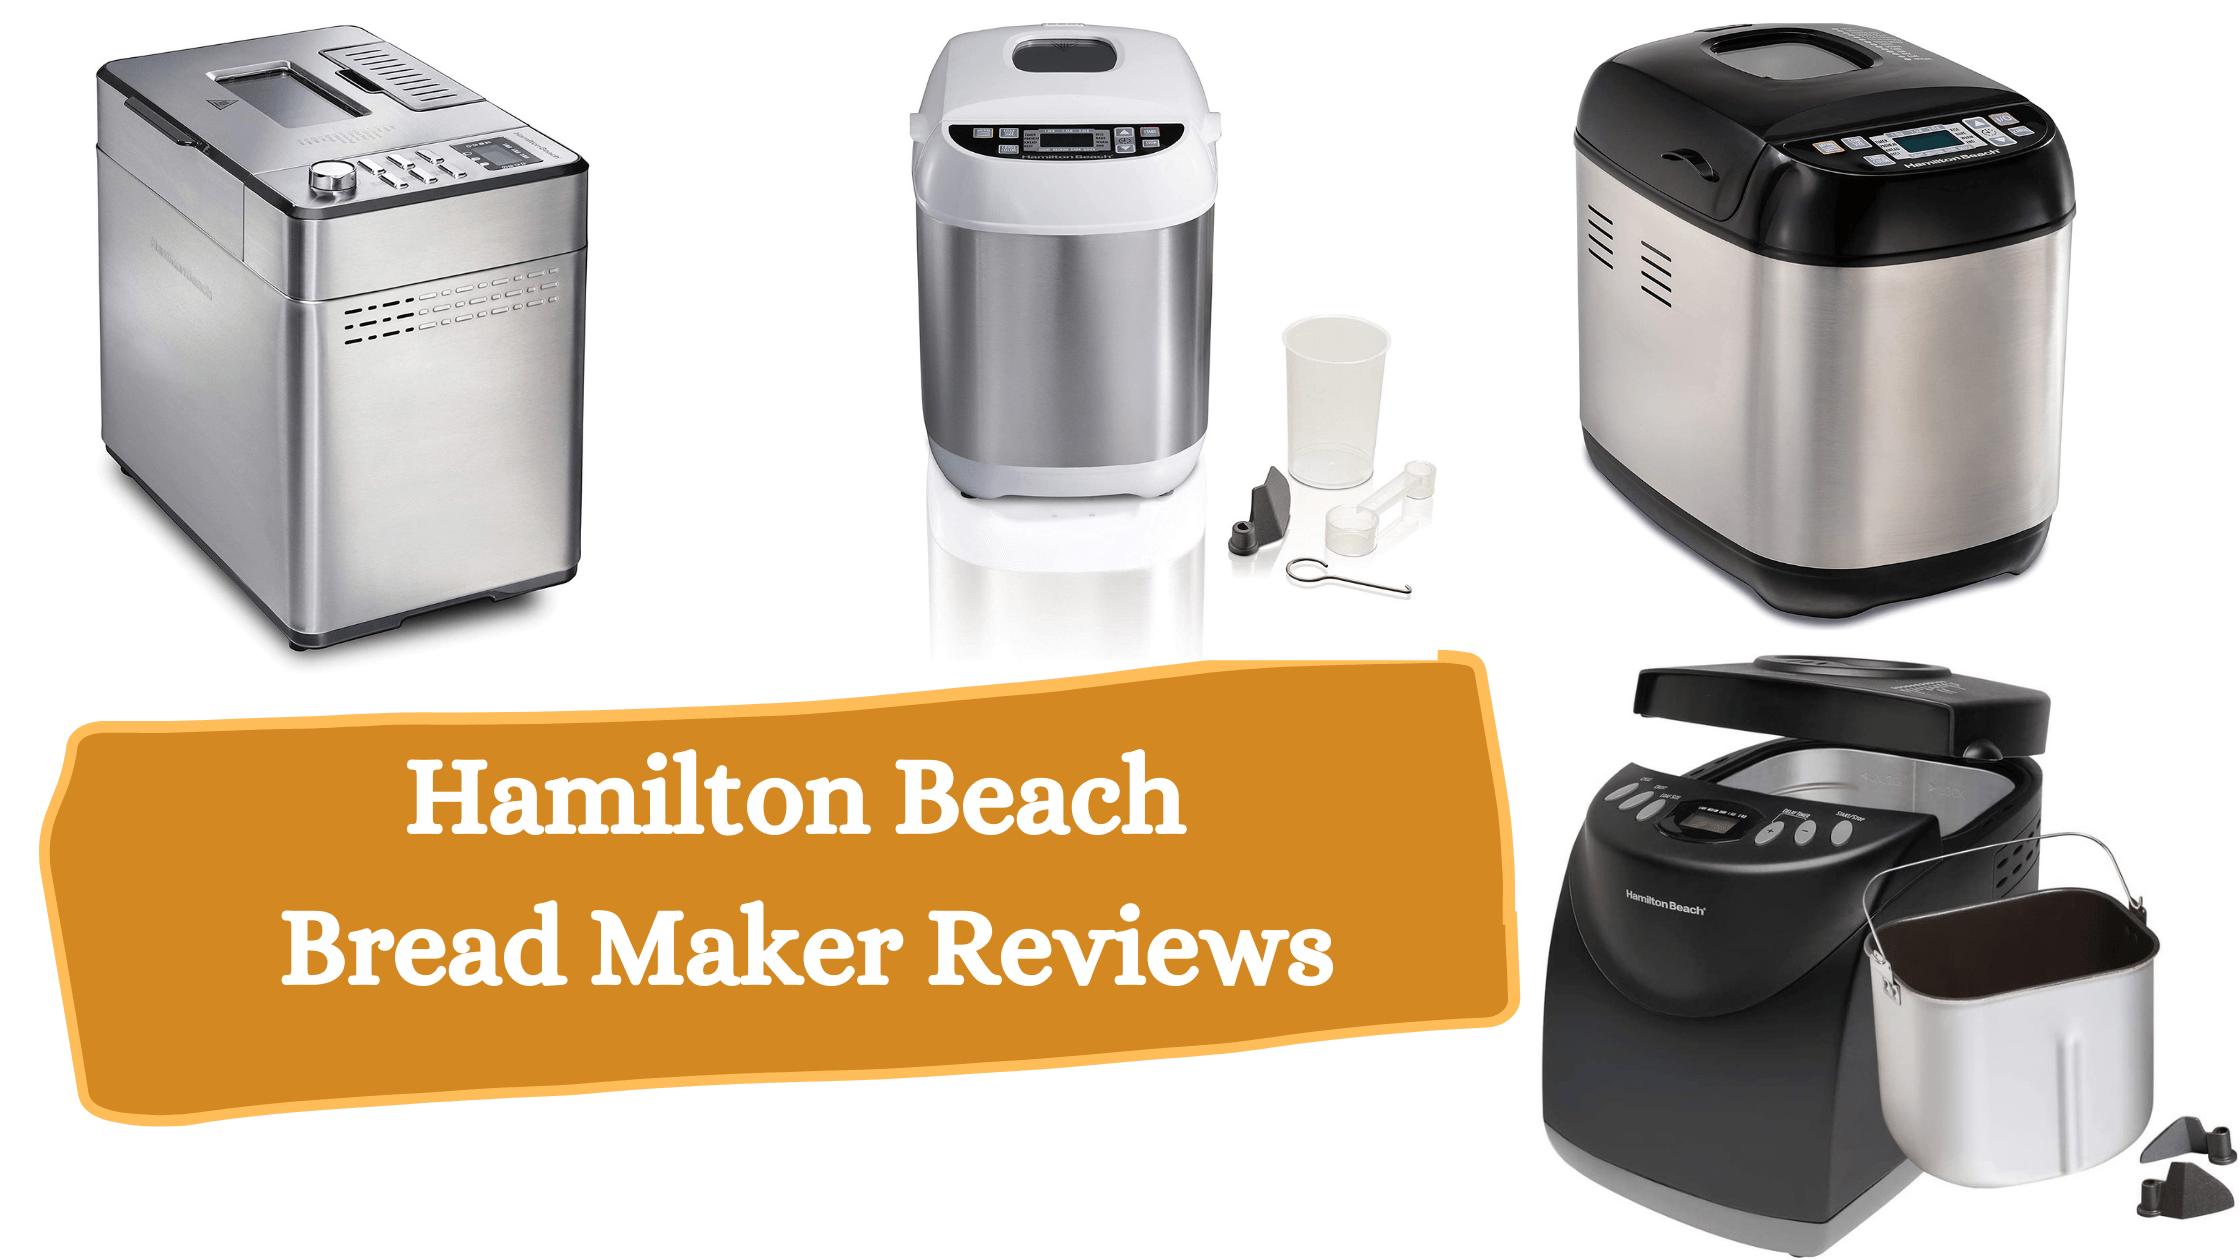 Hamilton Beach Bread Maker Reviews